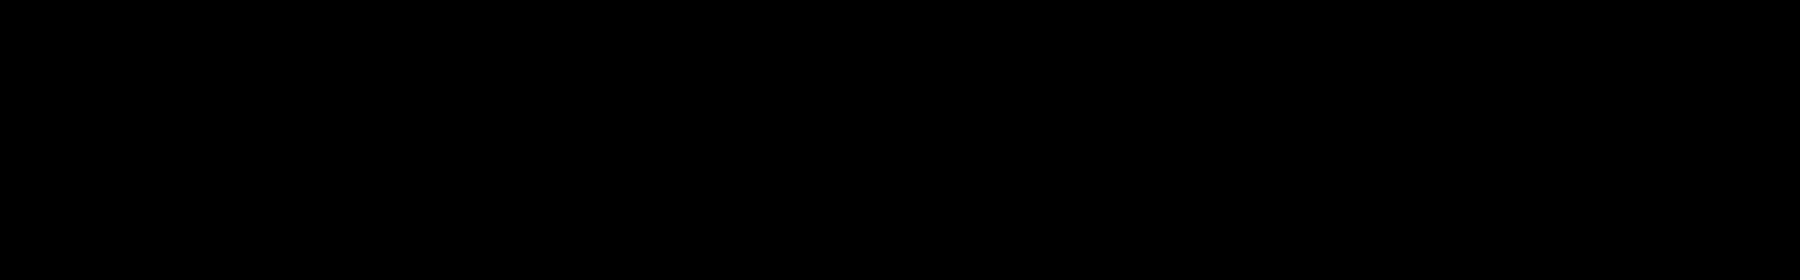 BLISS audio waveform